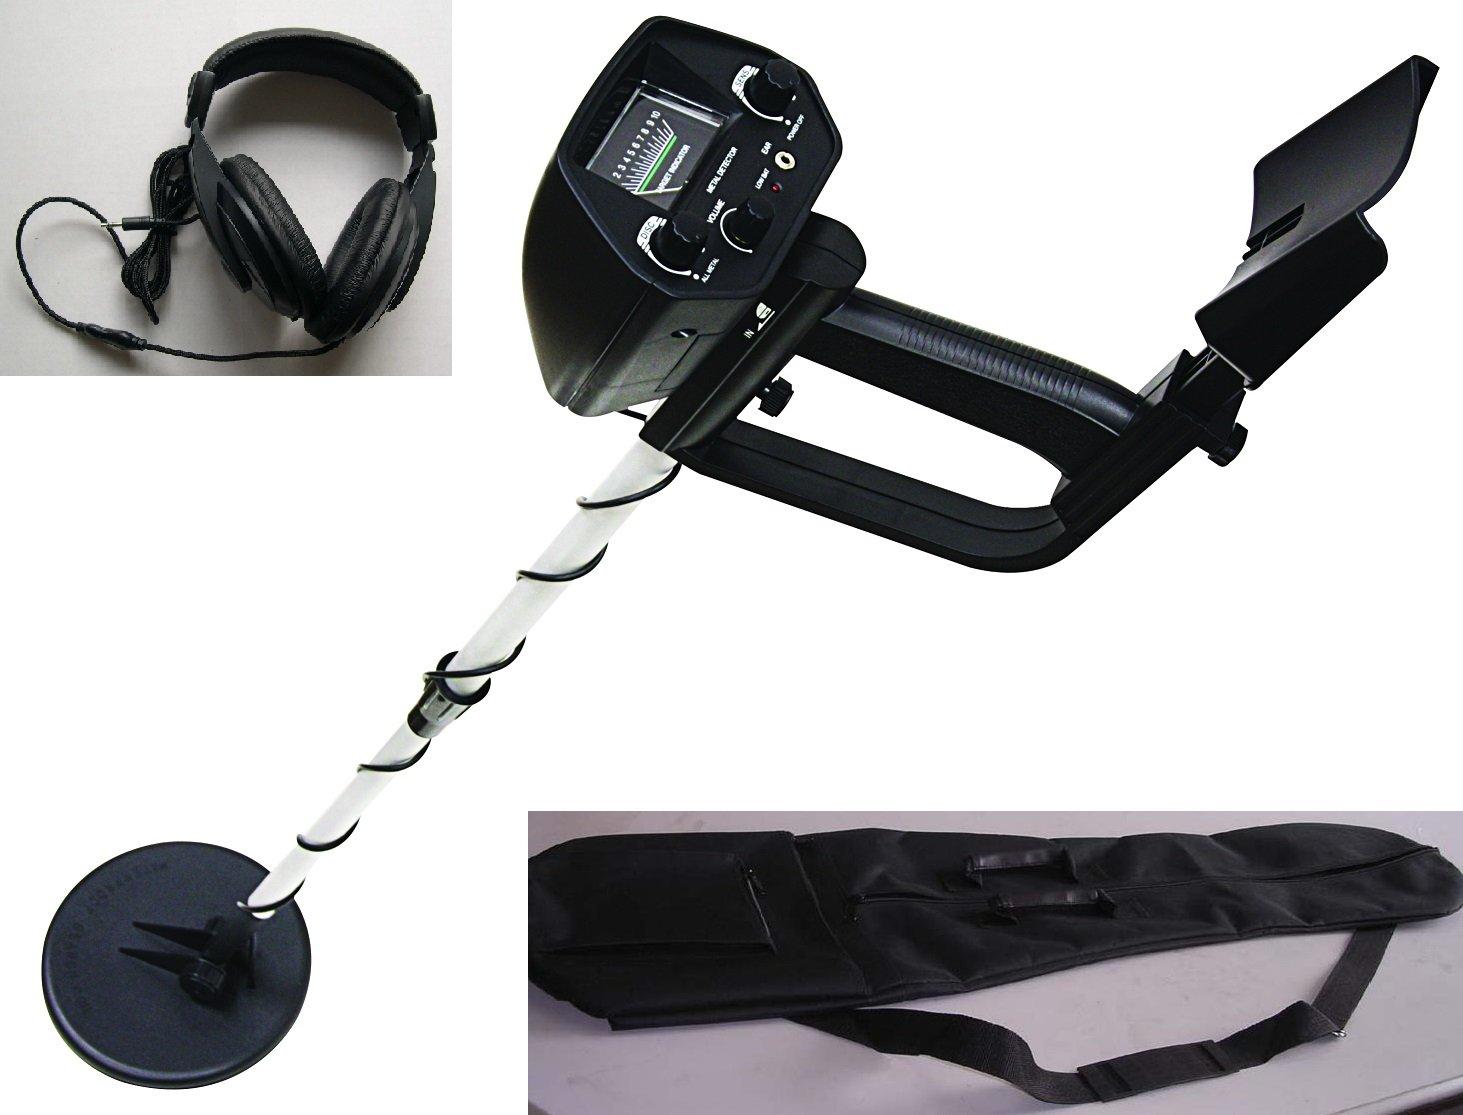 American Hawks Explorer Metal Detector Arm Support, View Meter, Waterproof Search Coil with Headphone, Bag, Batteries